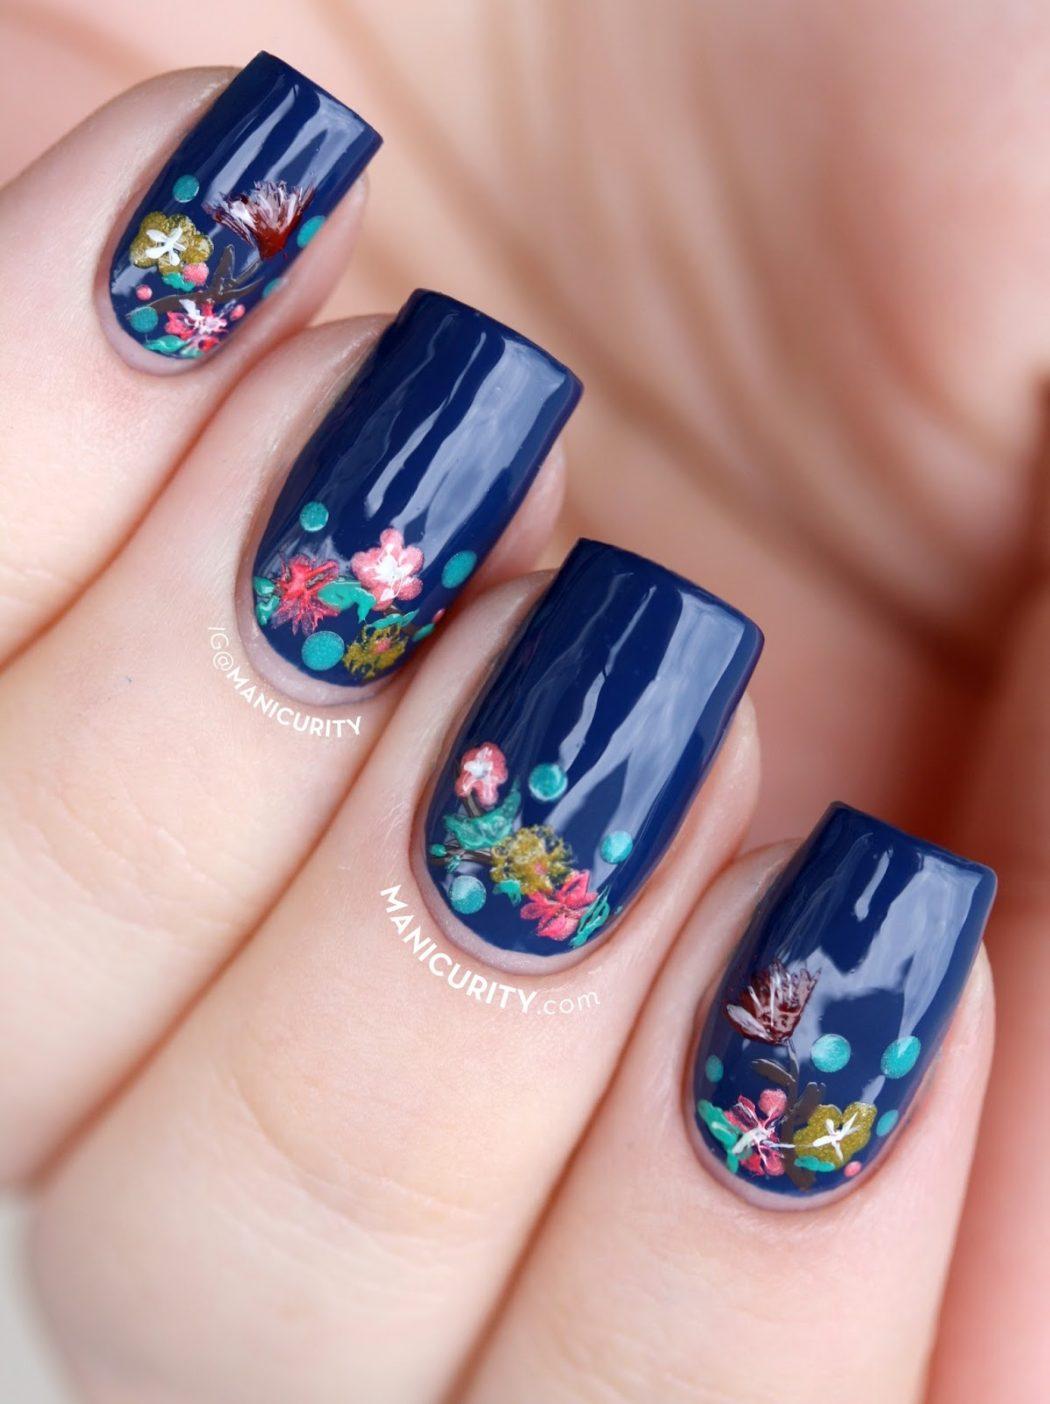 tiny-flower-nails-floral-half-moon-nail-art-china-glaze-5 50+ Coolest Wedding Nail Design Ideas